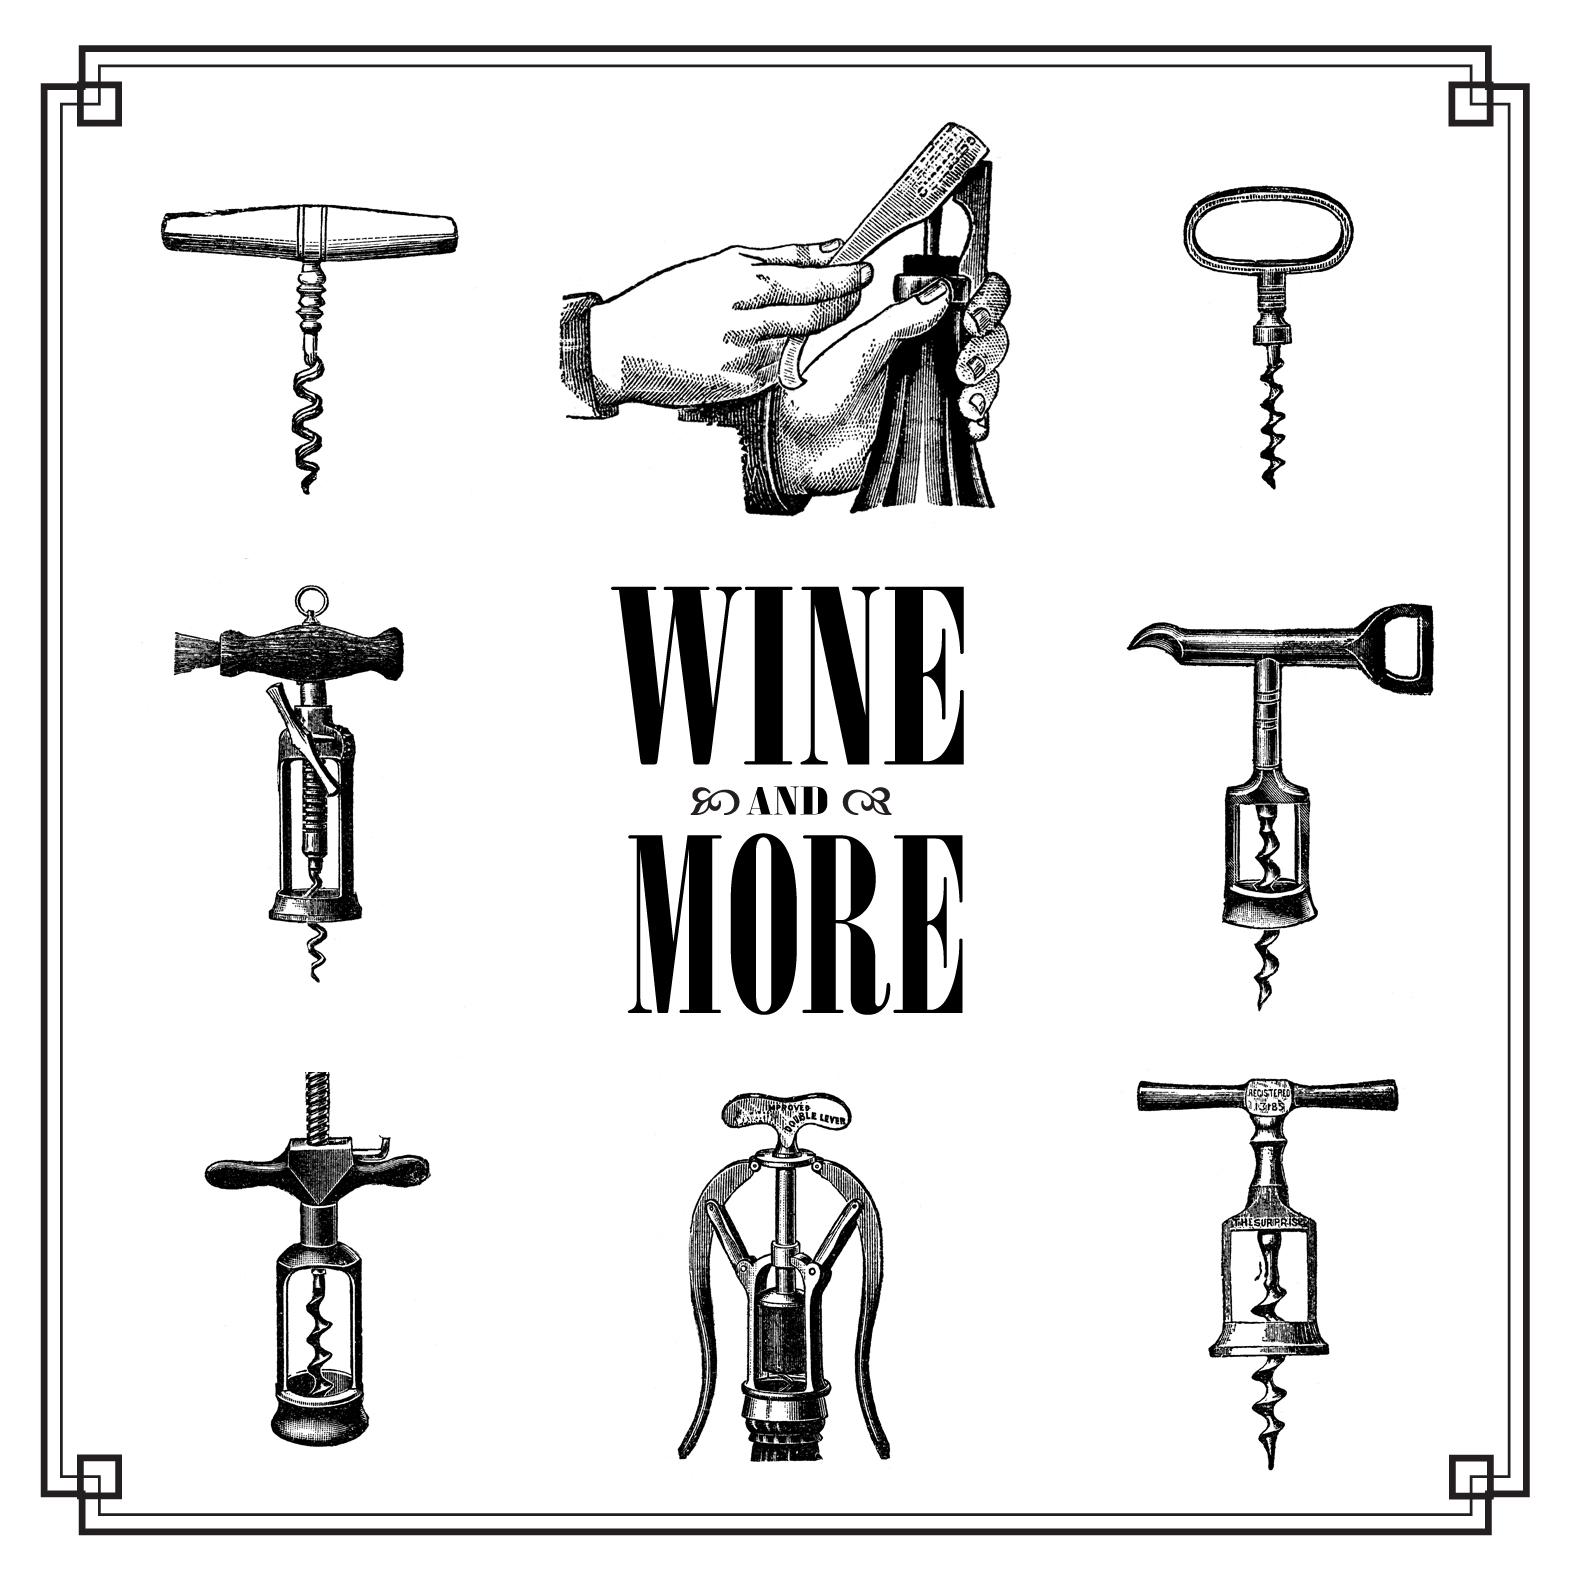 Free vintage clip art images: Vintage corkscrew wine openers.